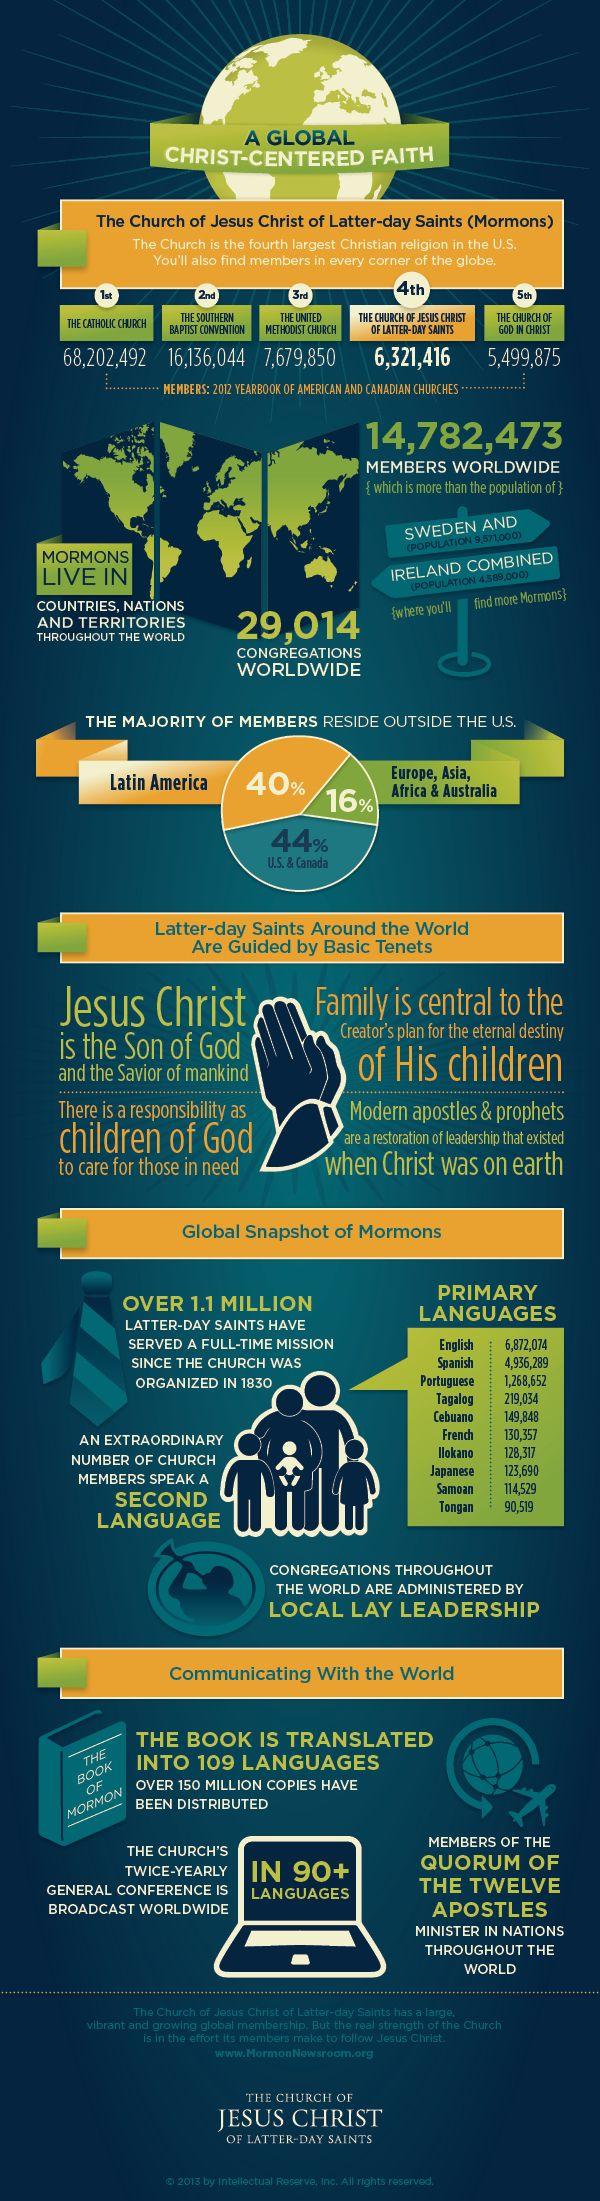 Infographics - LDS Newsroom. A Global Christ-centered faith.